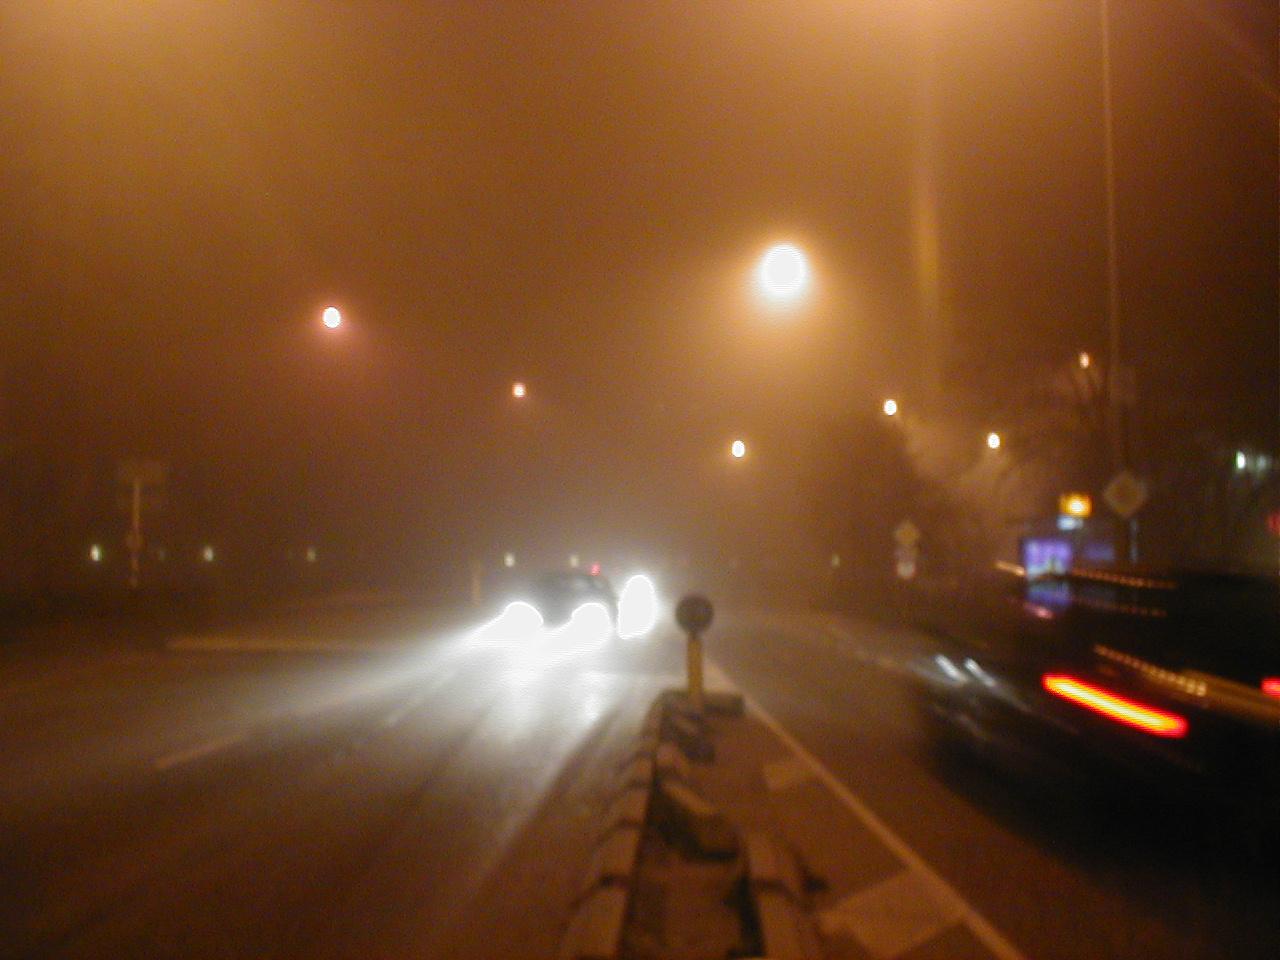 dario traffic headlight headlights night city